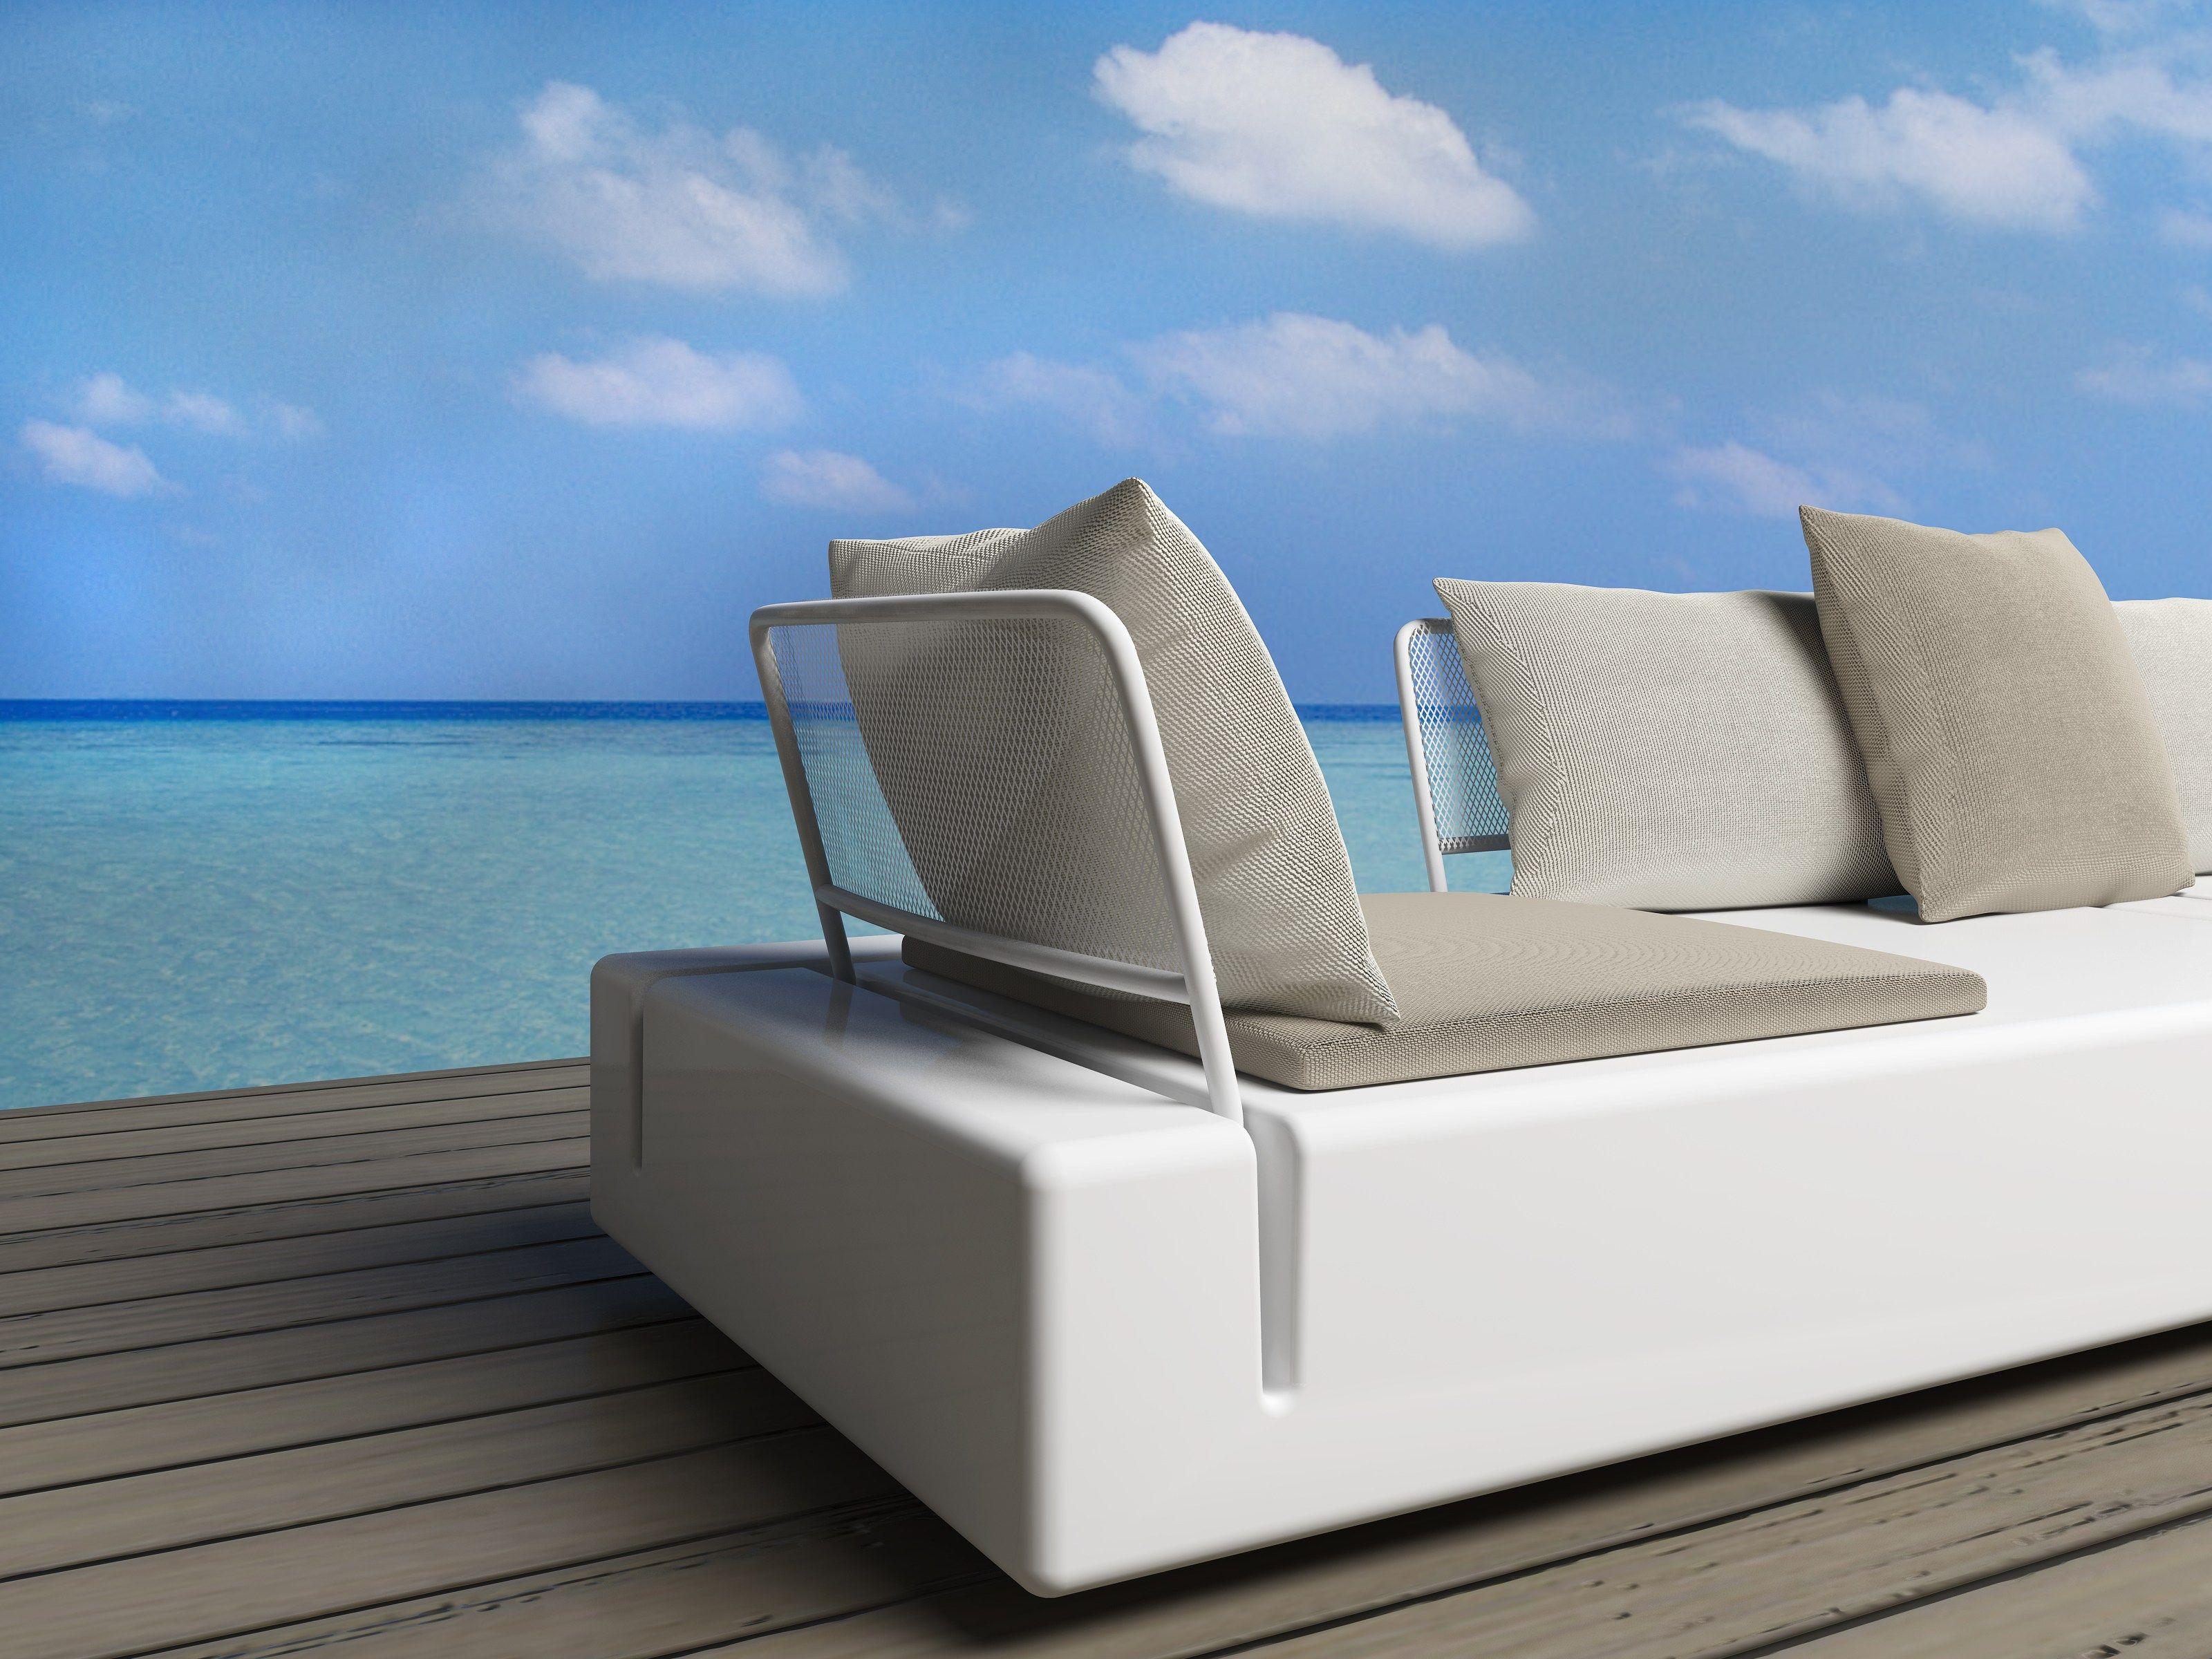 canap composable de jardin kes by vondom design buratti. Black Bedroom Furniture Sets. Home Design Ideas